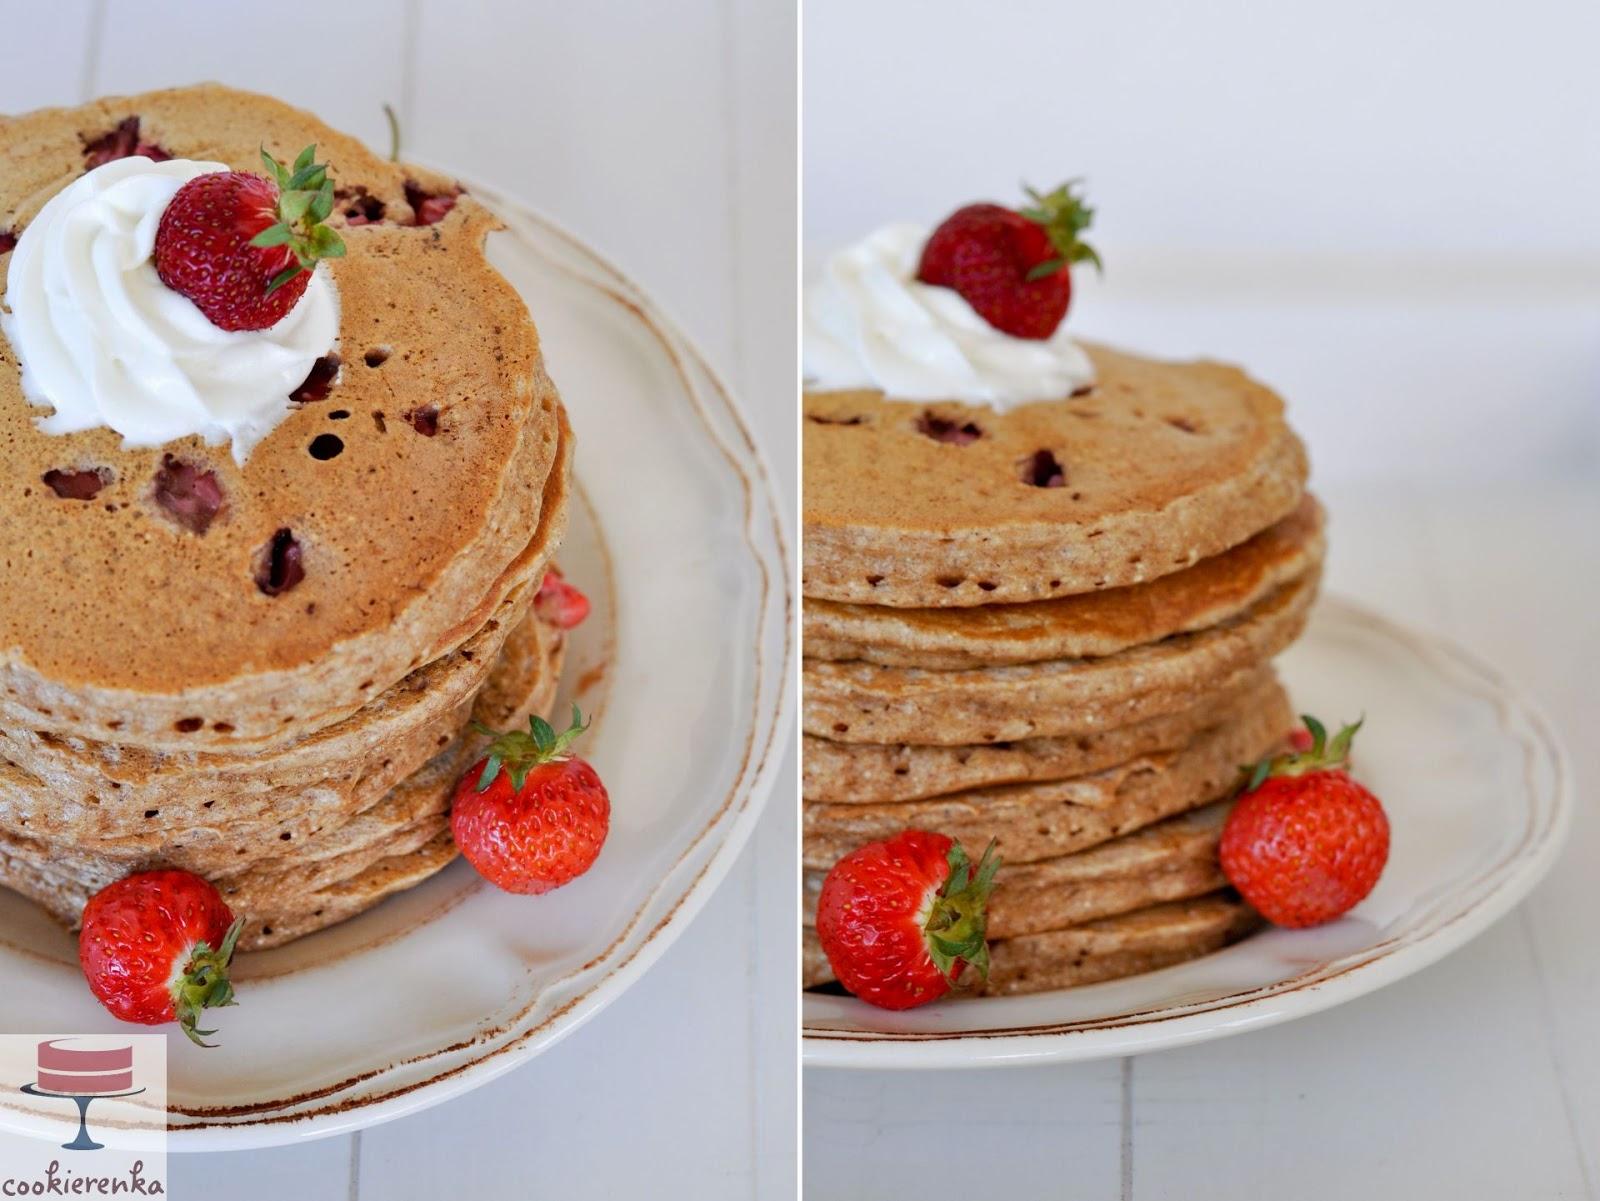 http://www.cookierenka.com/2014/06/lekkie-pancakes-truskawkowe.html